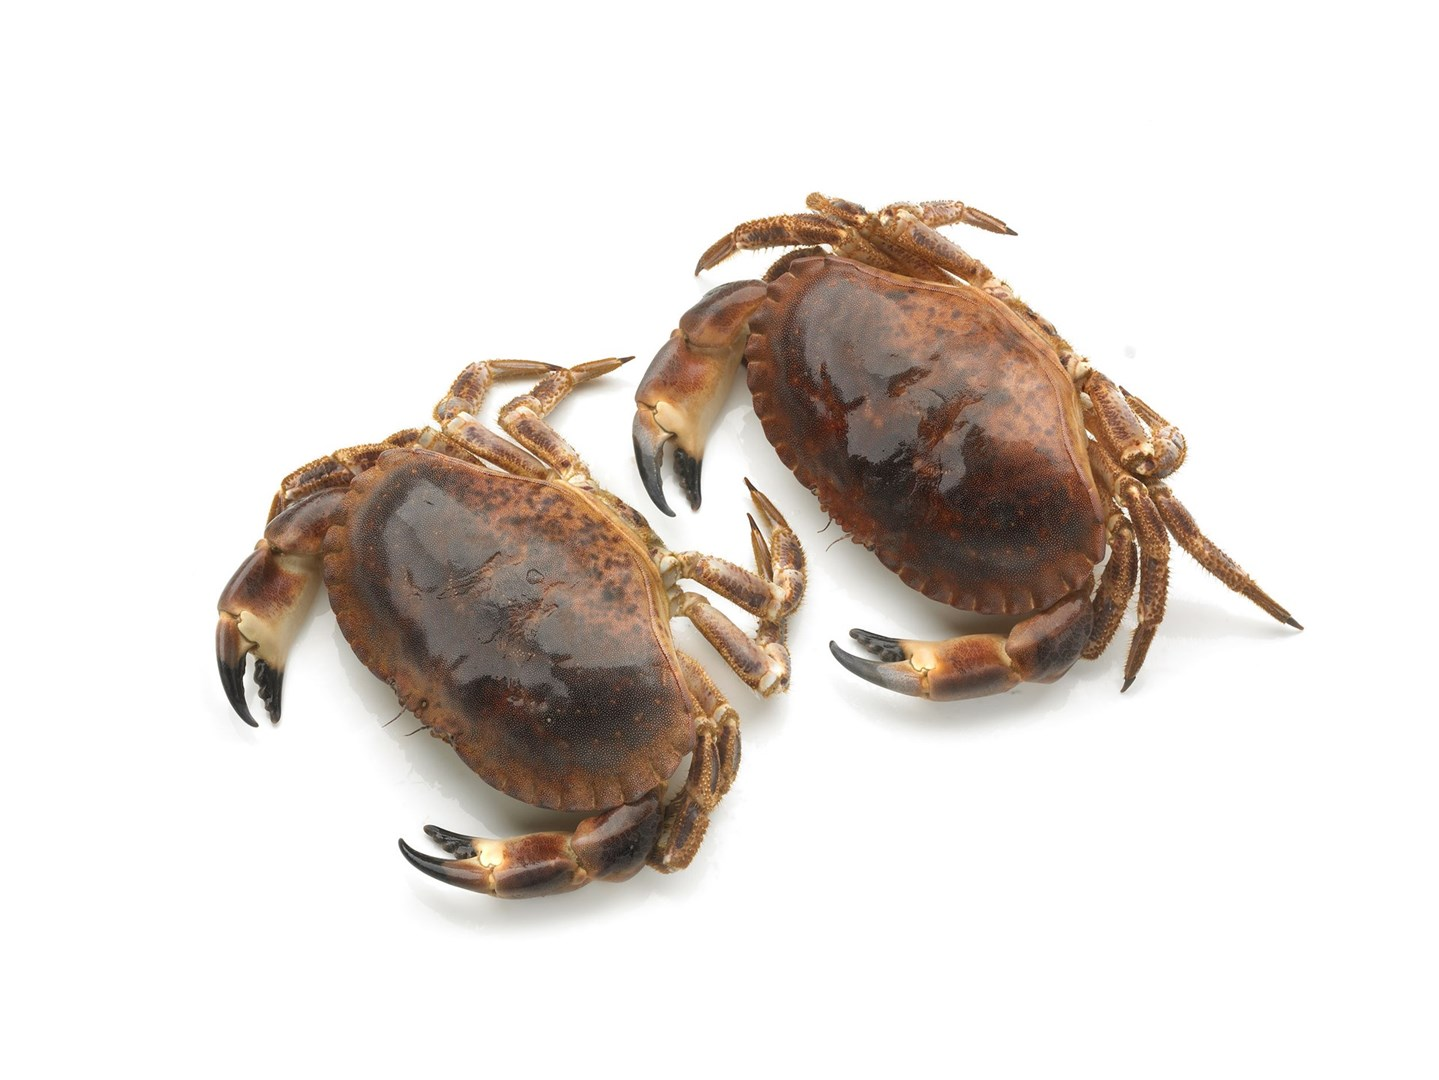 Productafbeelding Crab Tourteau